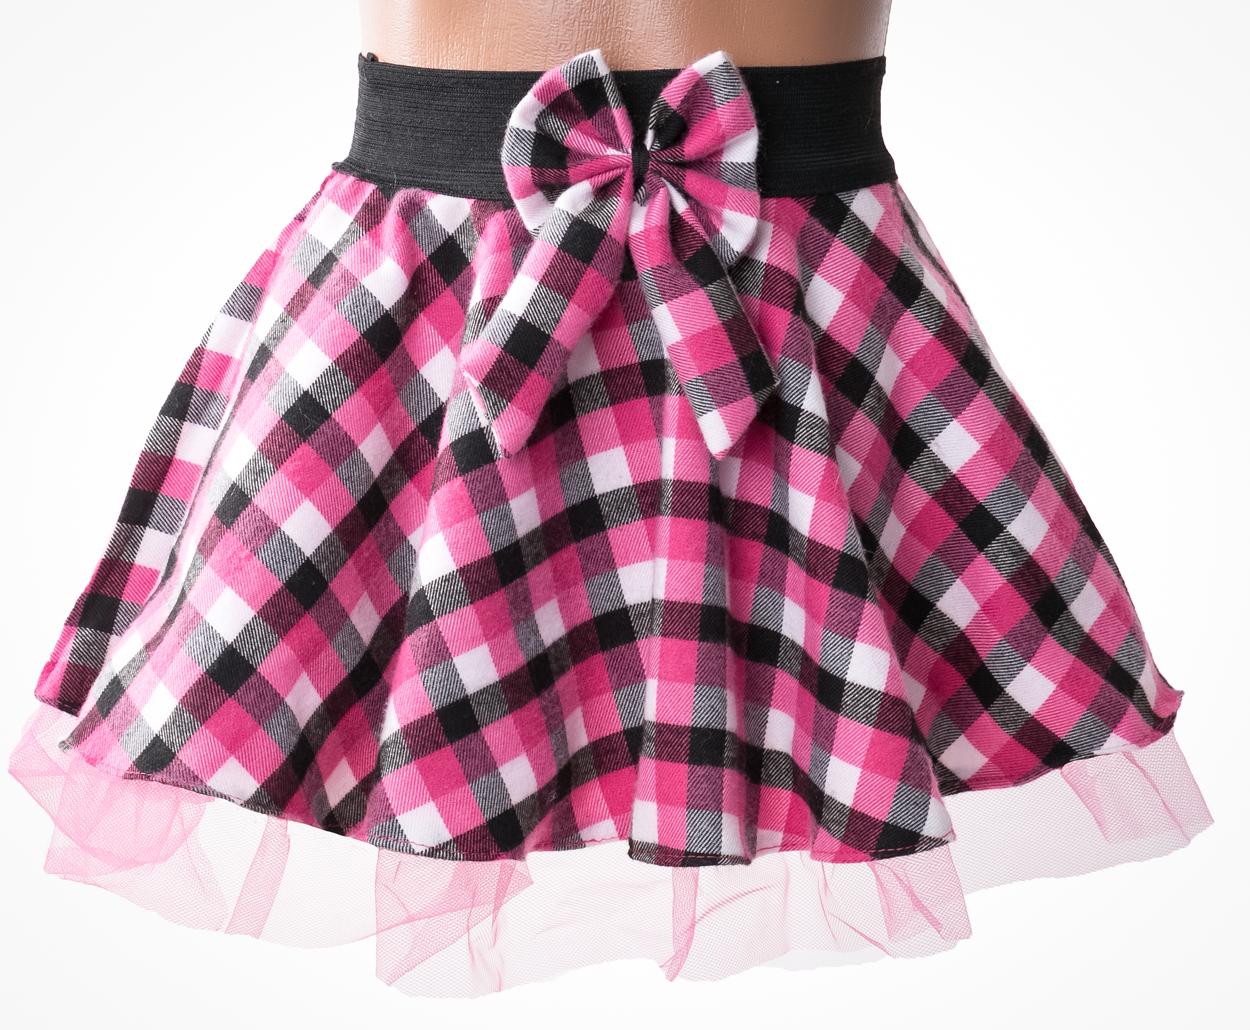 13bddd0b771b Dievčenská ružová karovaná sukňa - flanel